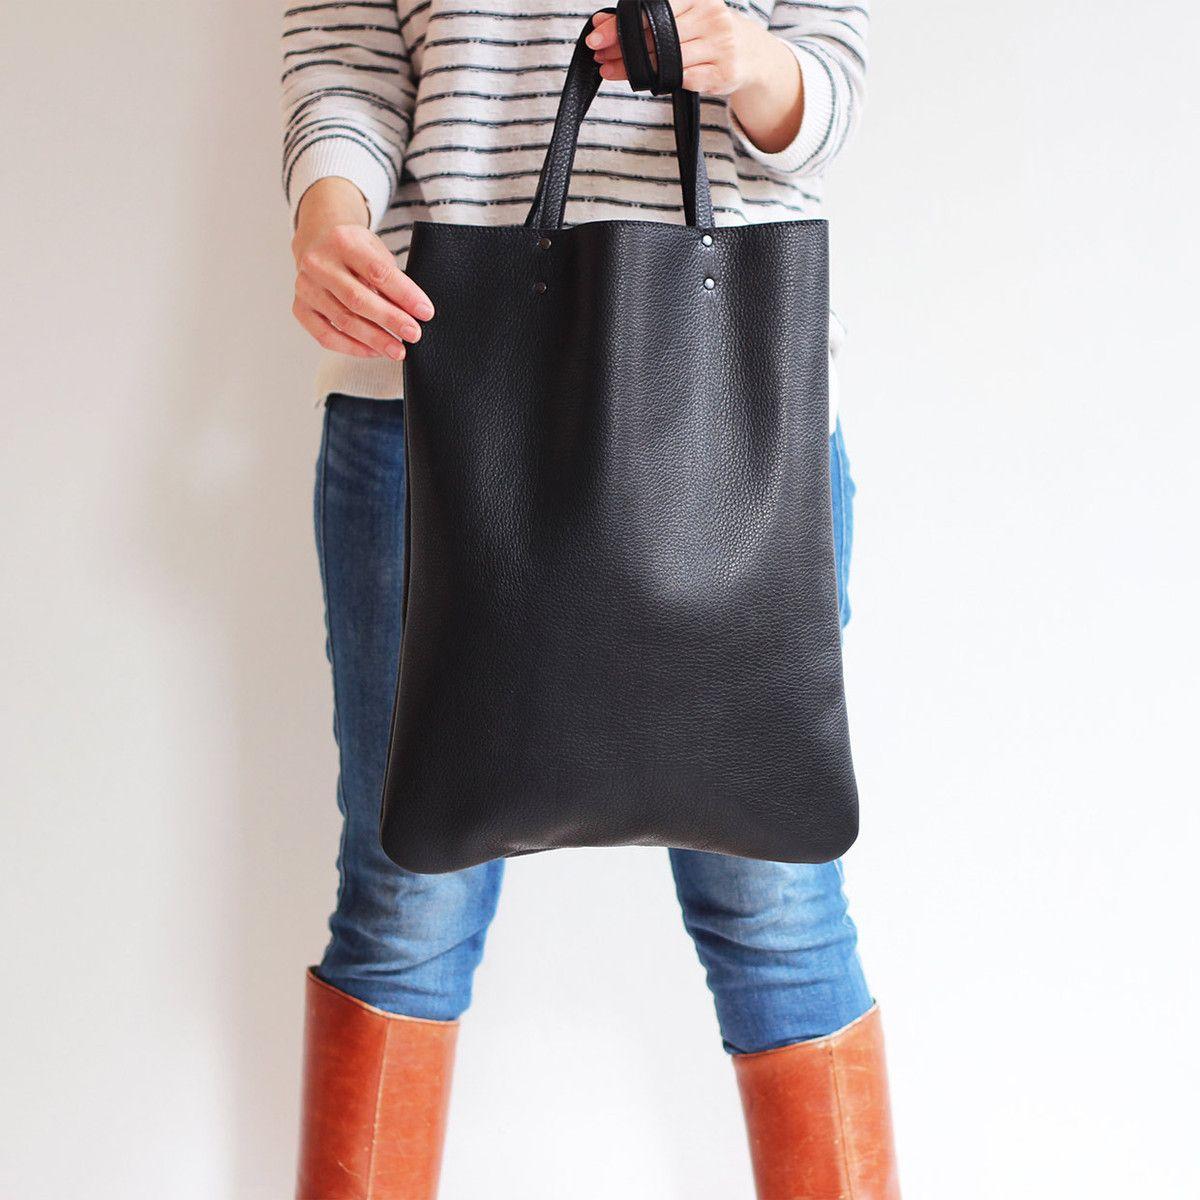 Leather Tote Bag Black